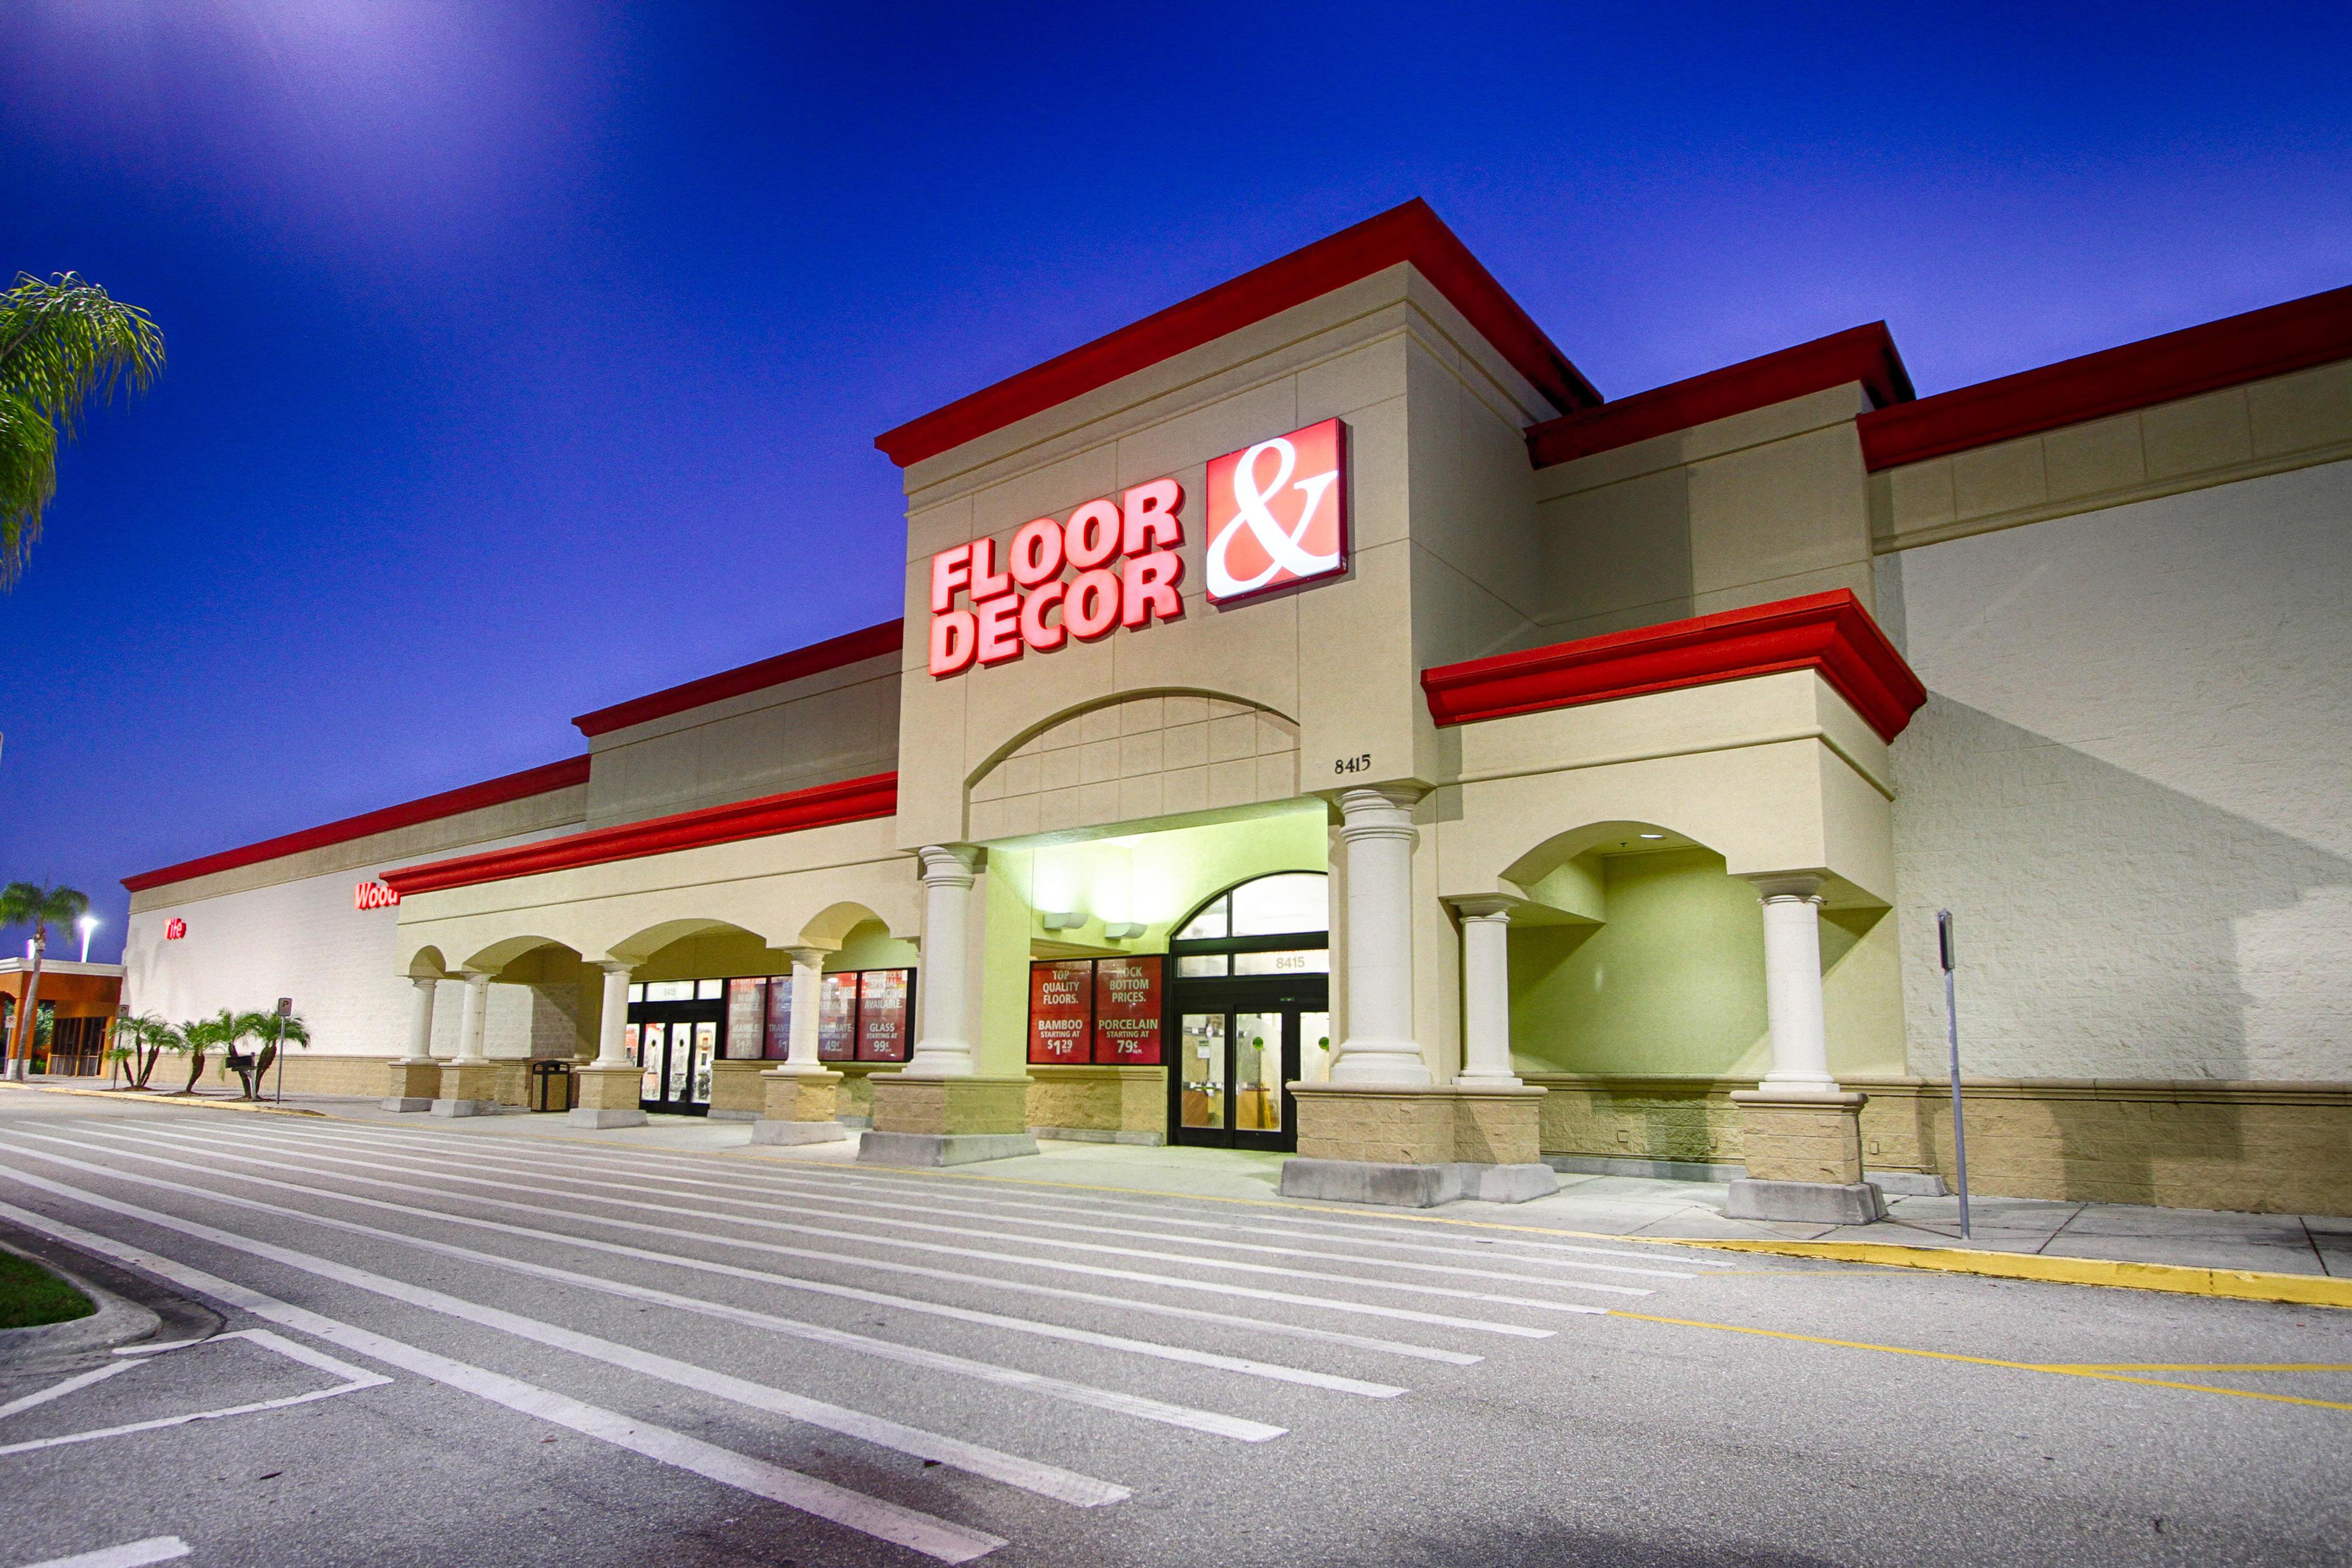 Floor Amp Decor Coupons Near Me In Sarasota Fl 34243 8coupons